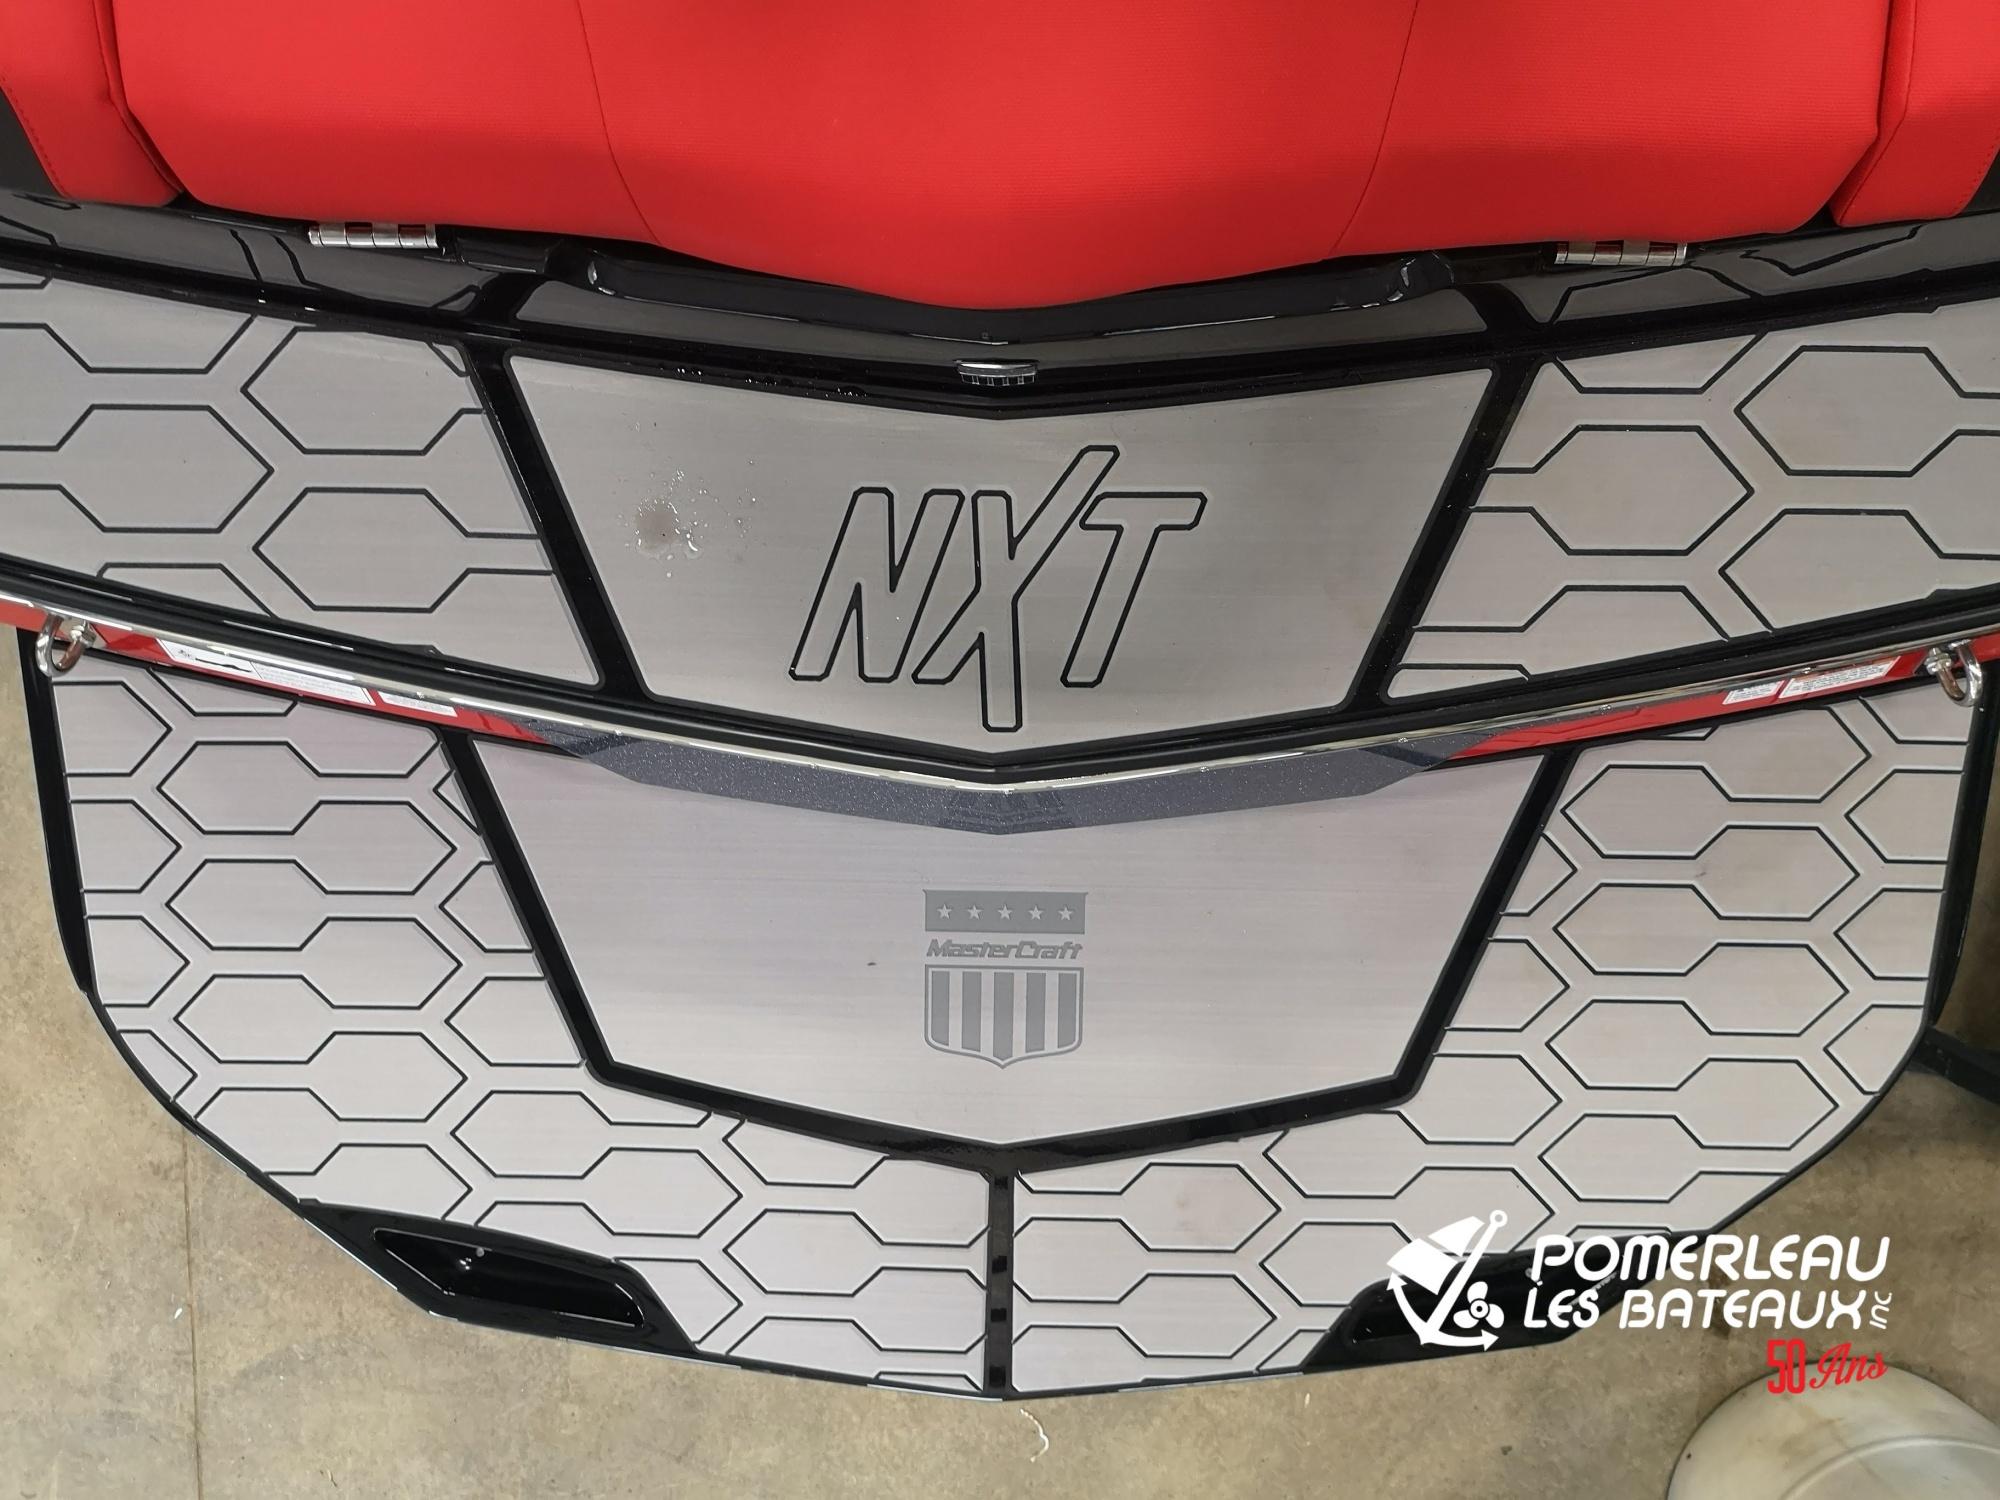 Mastercraft NXT 22 - IMG_20210326_142512